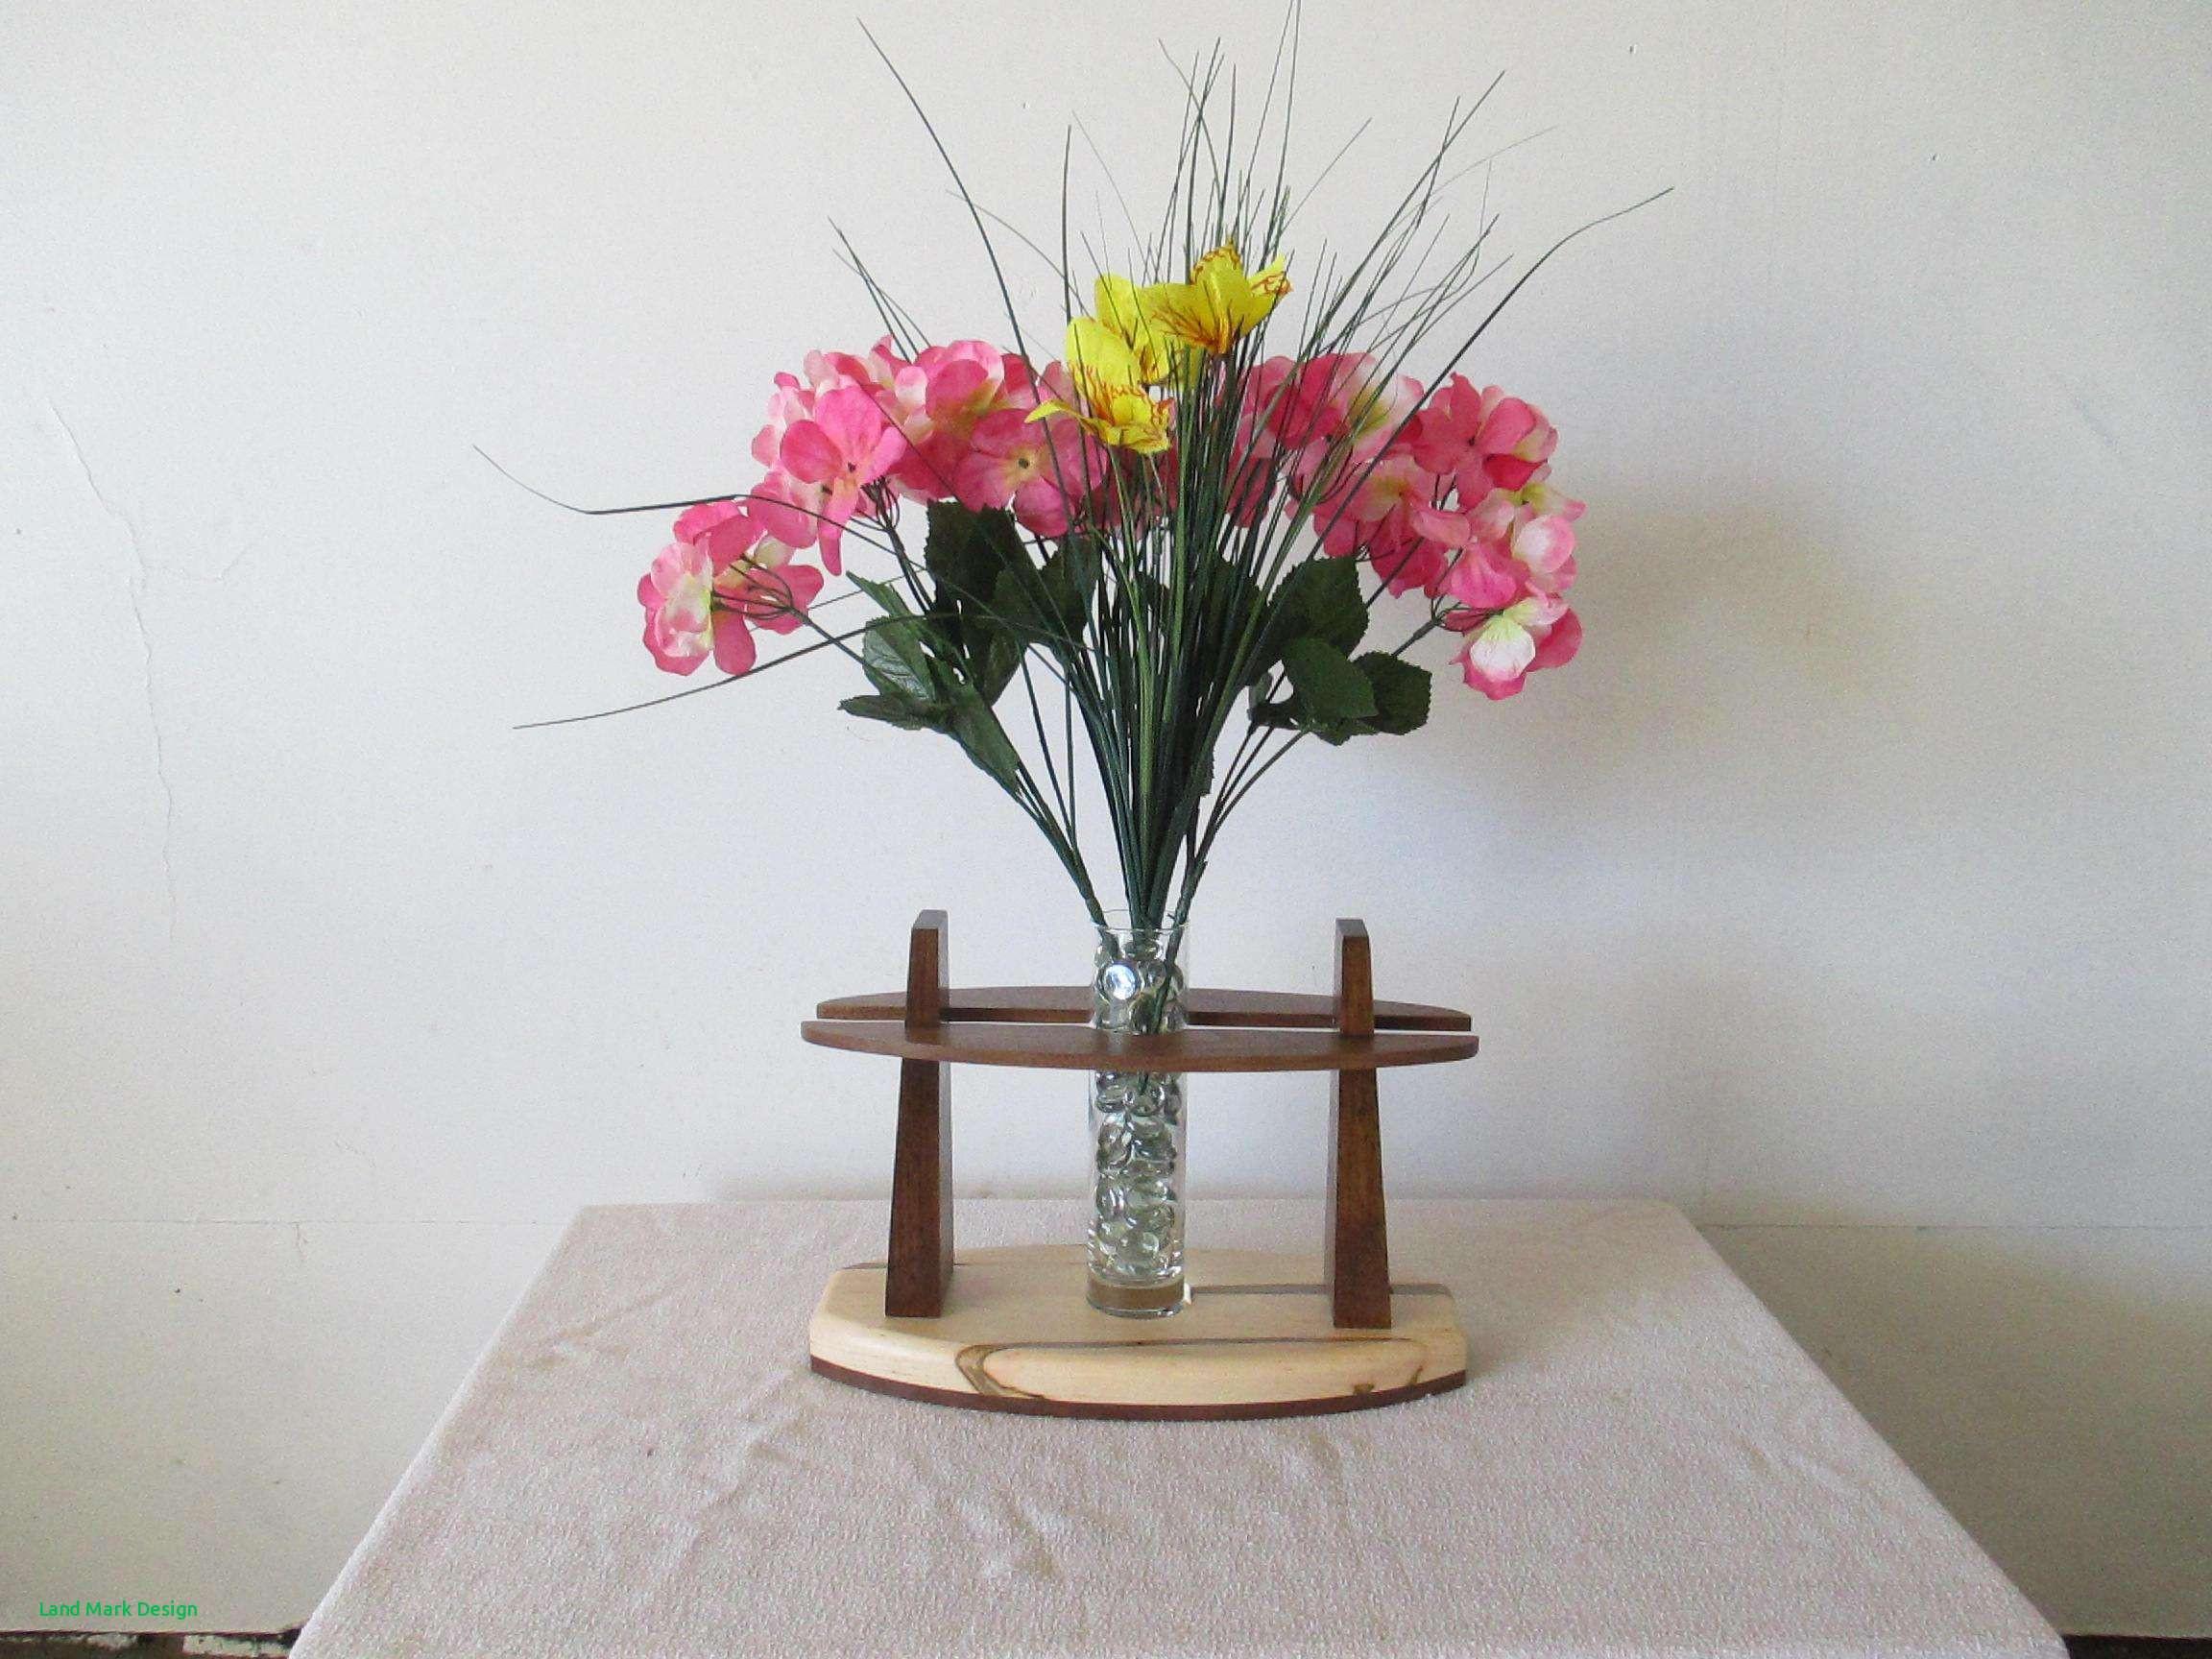 personalised grave vase of latest flower design design home design in full size of living room nautical vase elegant nautical centerpieceh vases vase savei 0d uk